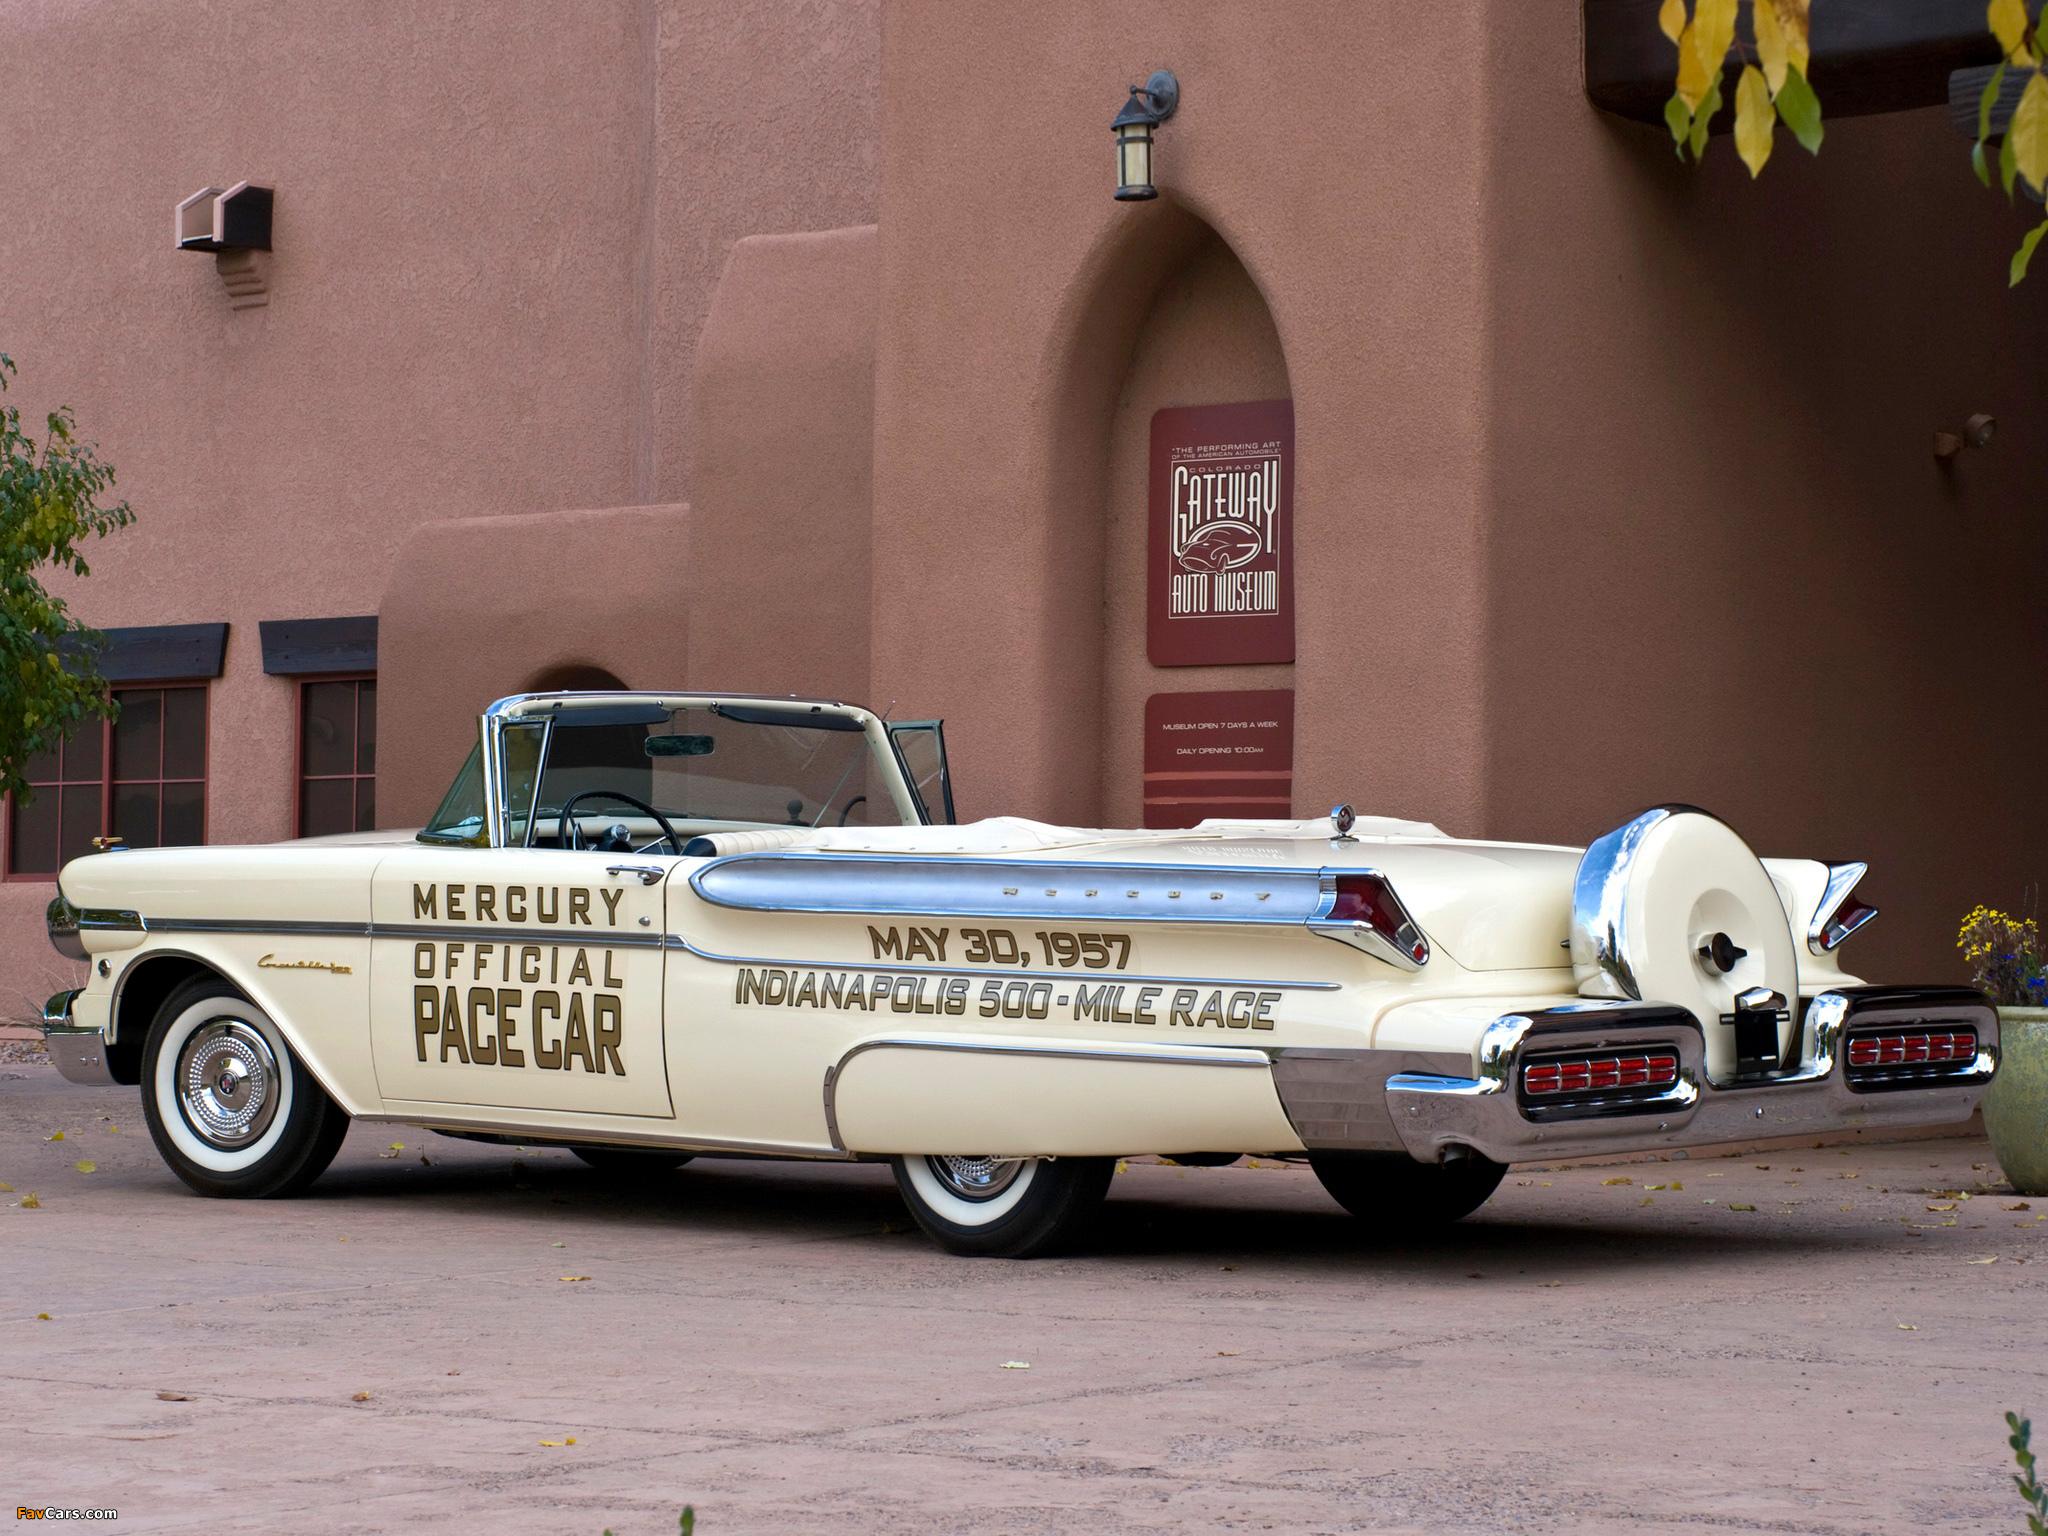 1957 mercury turnpike cruiser pace car convertible - Mercury Turnpike Cruiser Convertible Indy 500 Pace Car 76s 1957 Wallpapers 2048 X